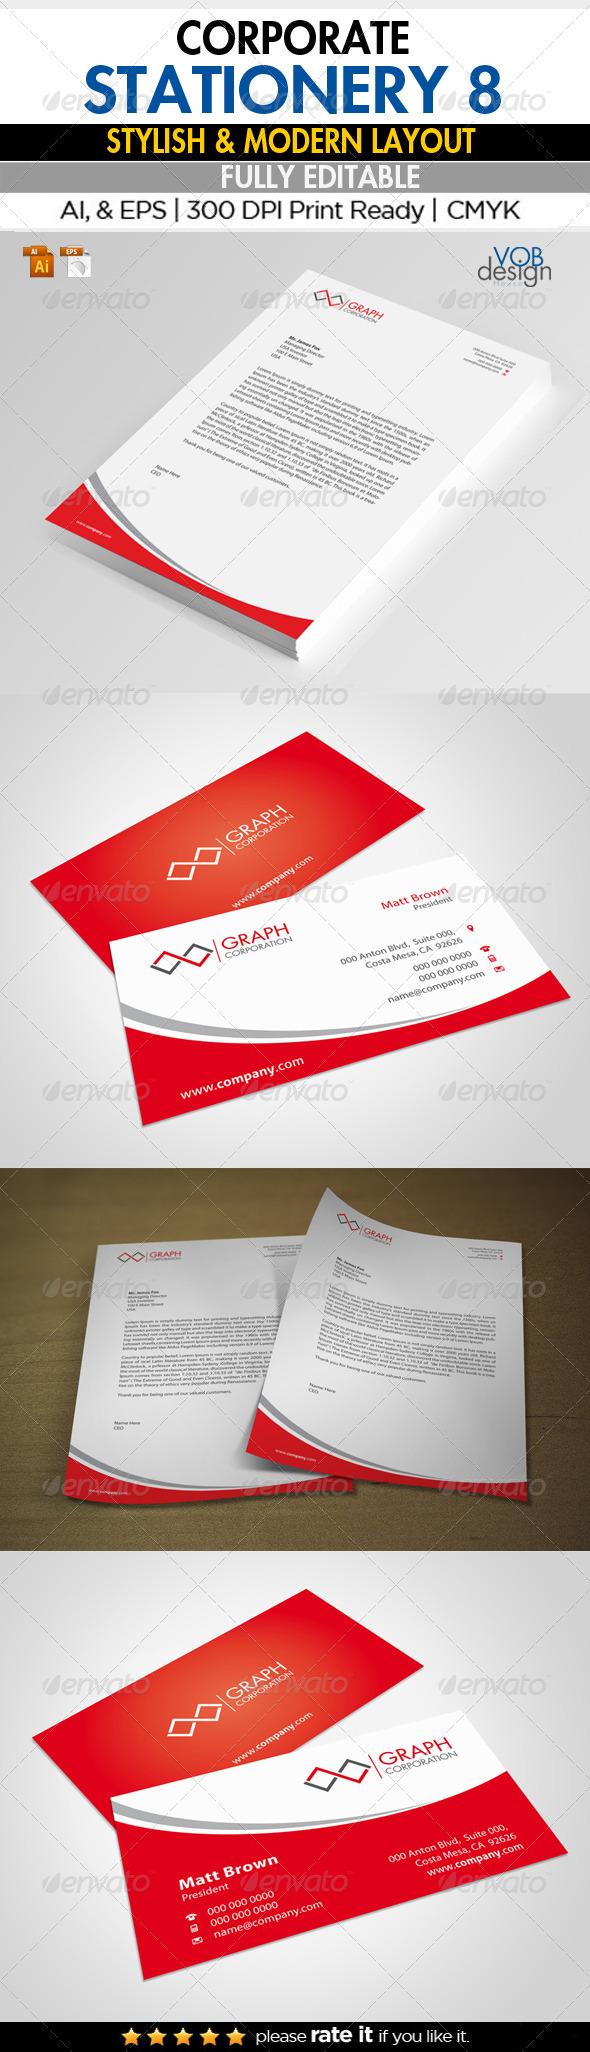 GraphicRiver Corporate Stationery 8 6431188